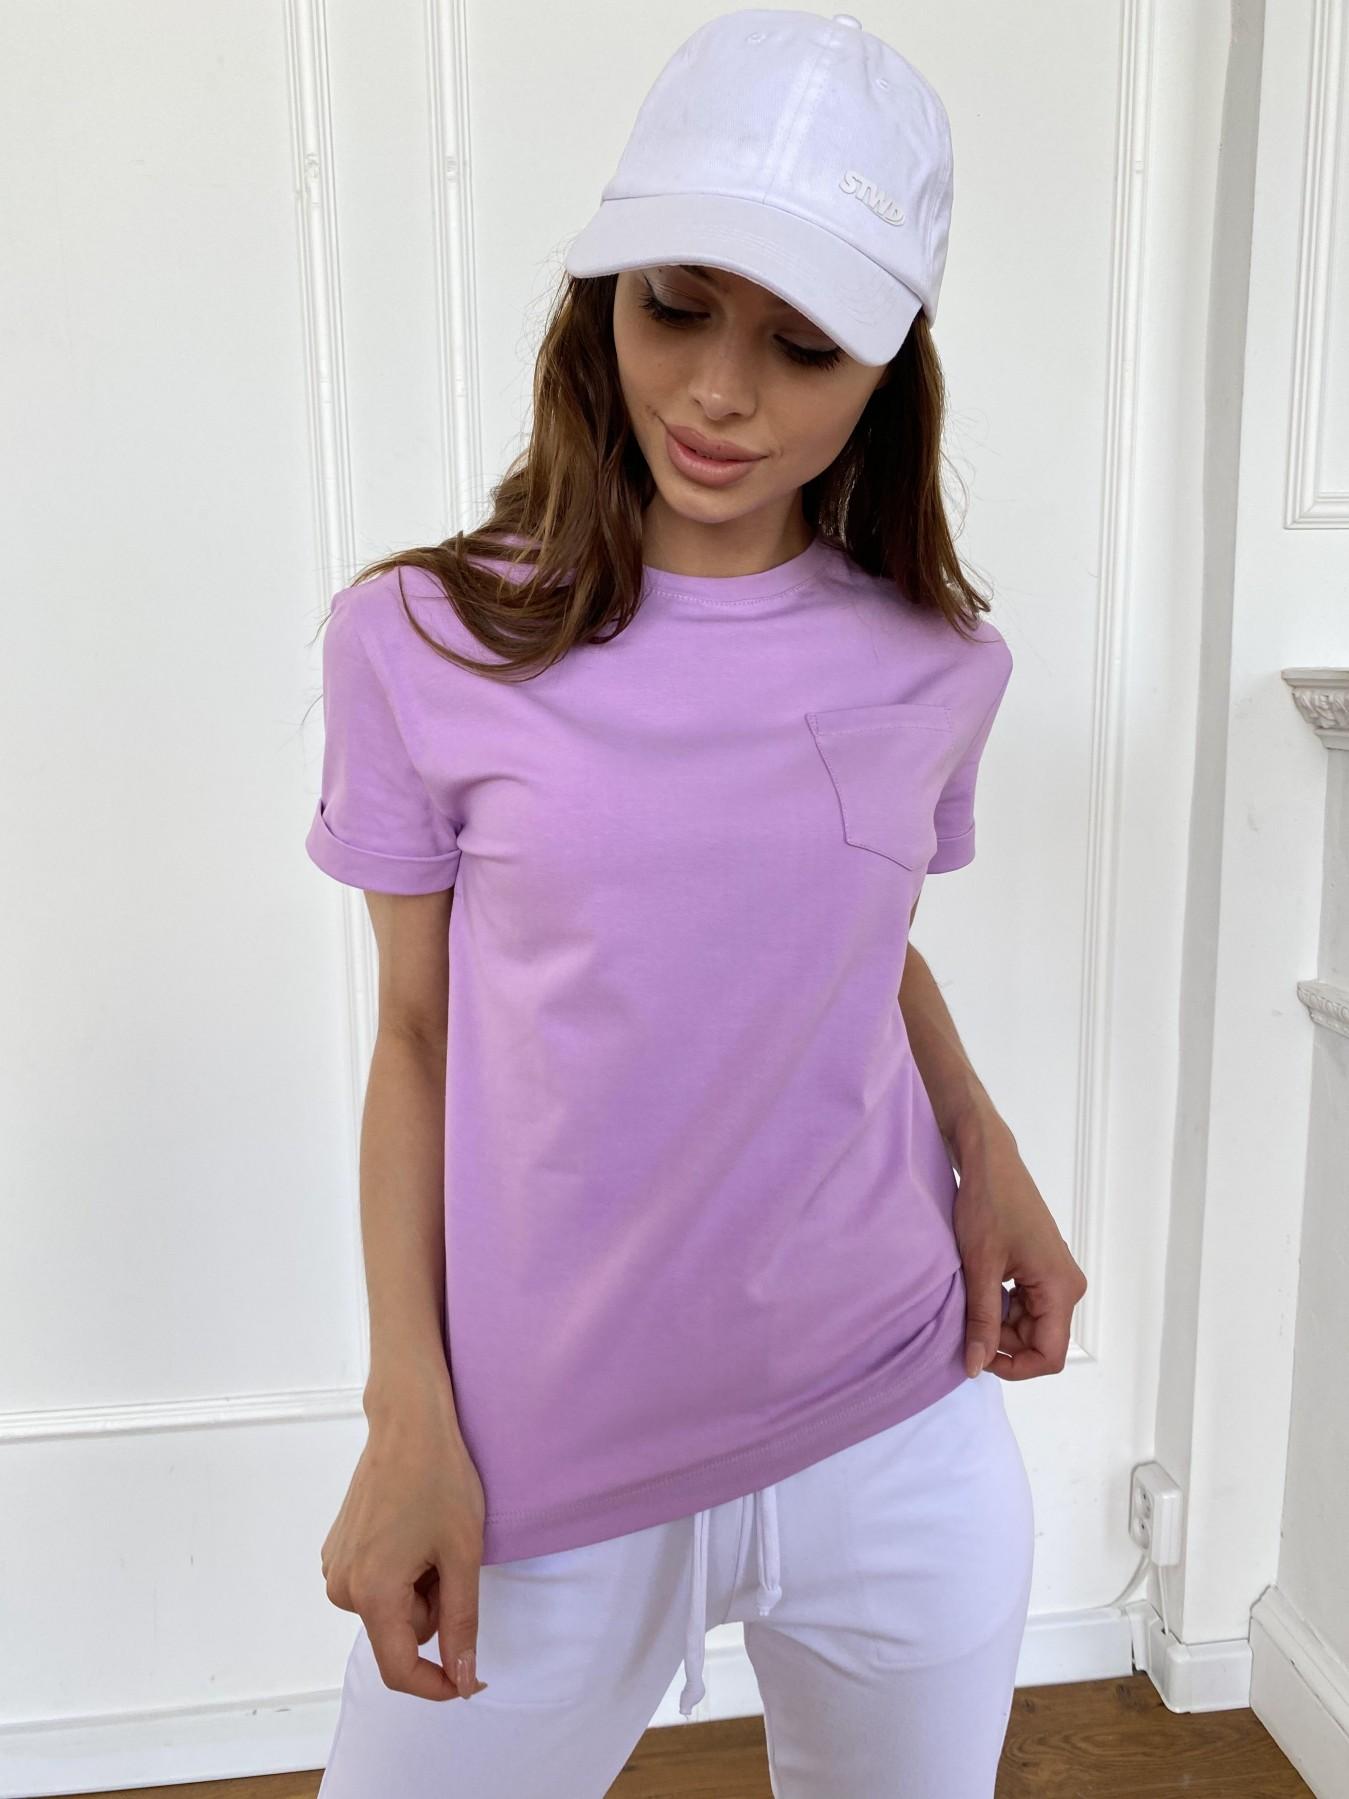 Вуди футболка из вискозы 11224 АРТ. 47879 Цвет: Лаванда - фото 4, интернет магазин tm-modus.ru